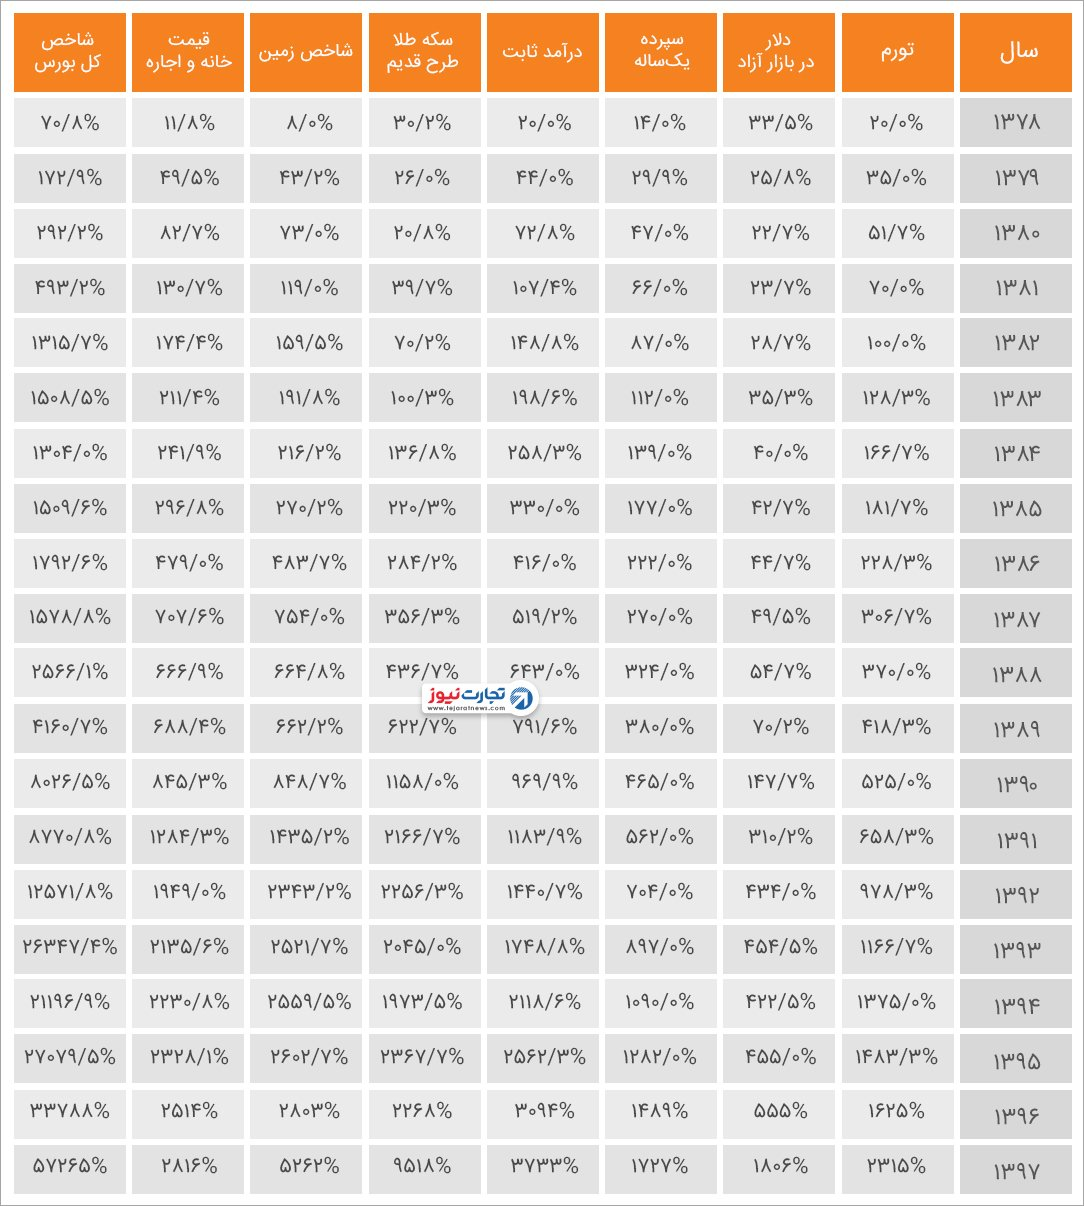 جدول قيمت دلار سكه بورس بانك زمين مسكن